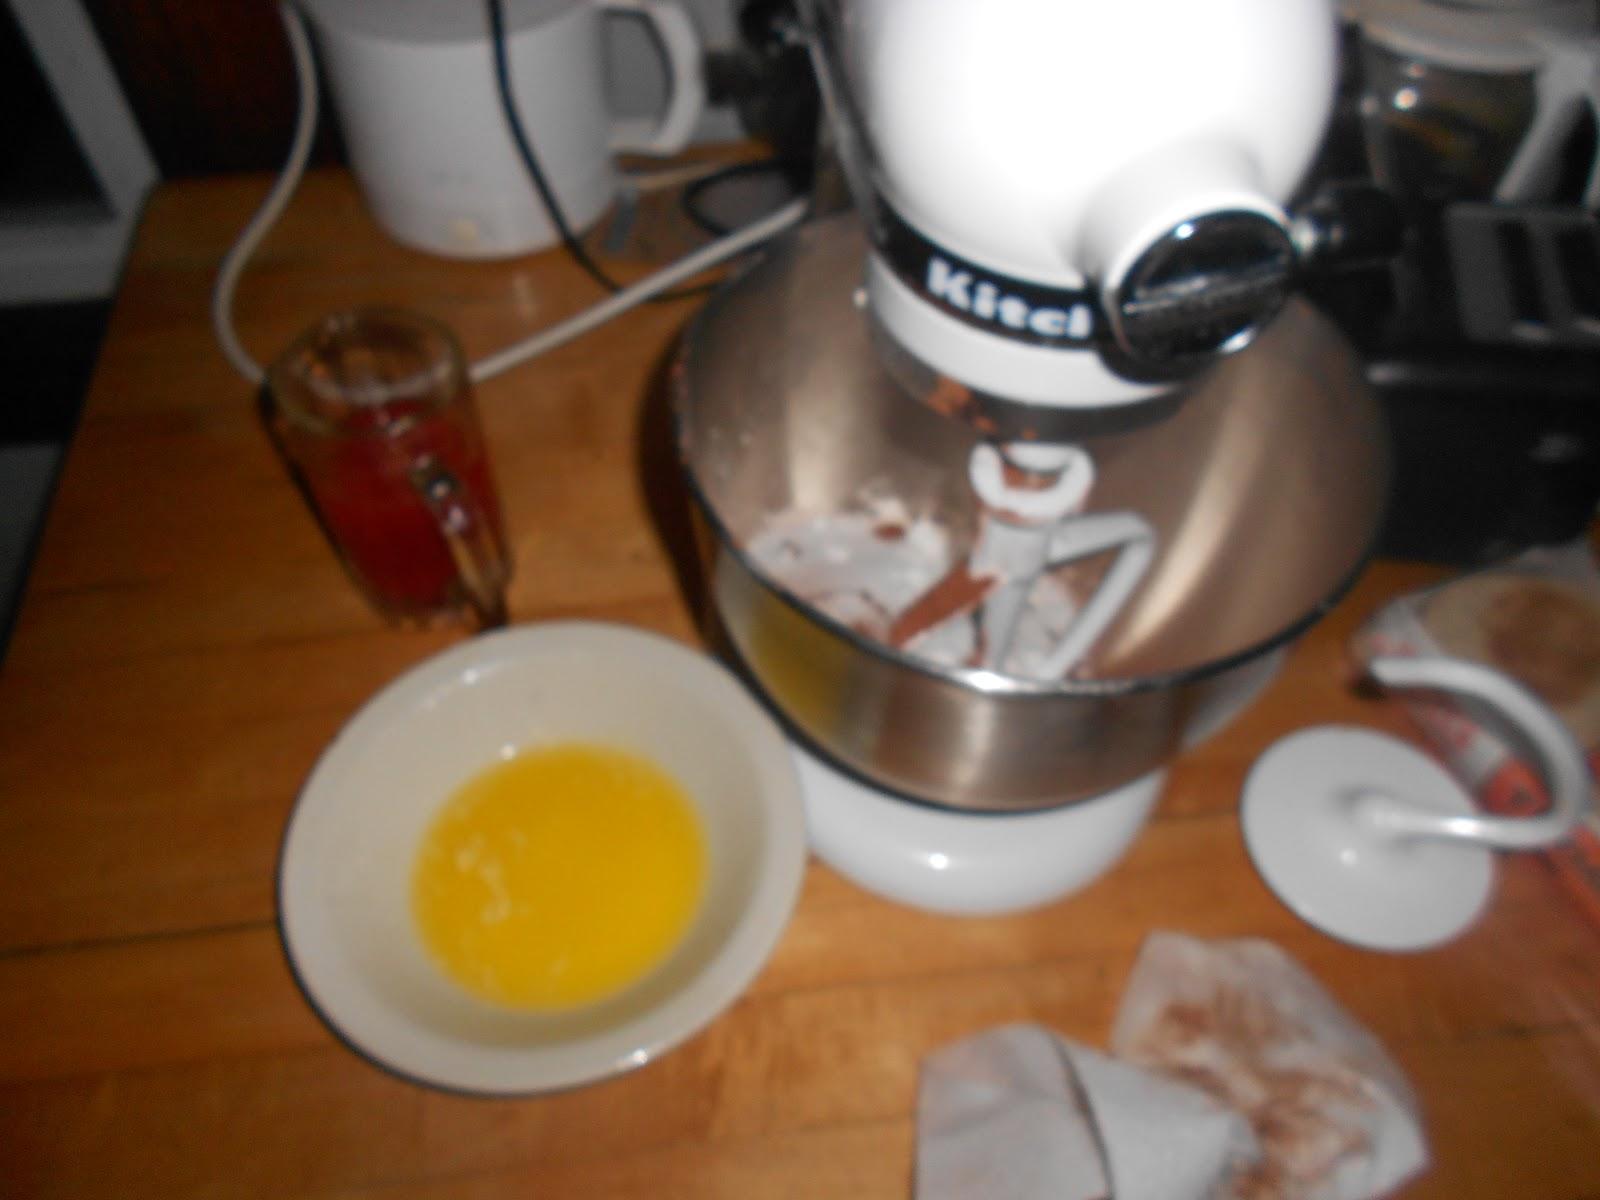 Accidental Cream Pie Ele the accidental brainwashed foodie: banana cream pie (lucky peach 2)